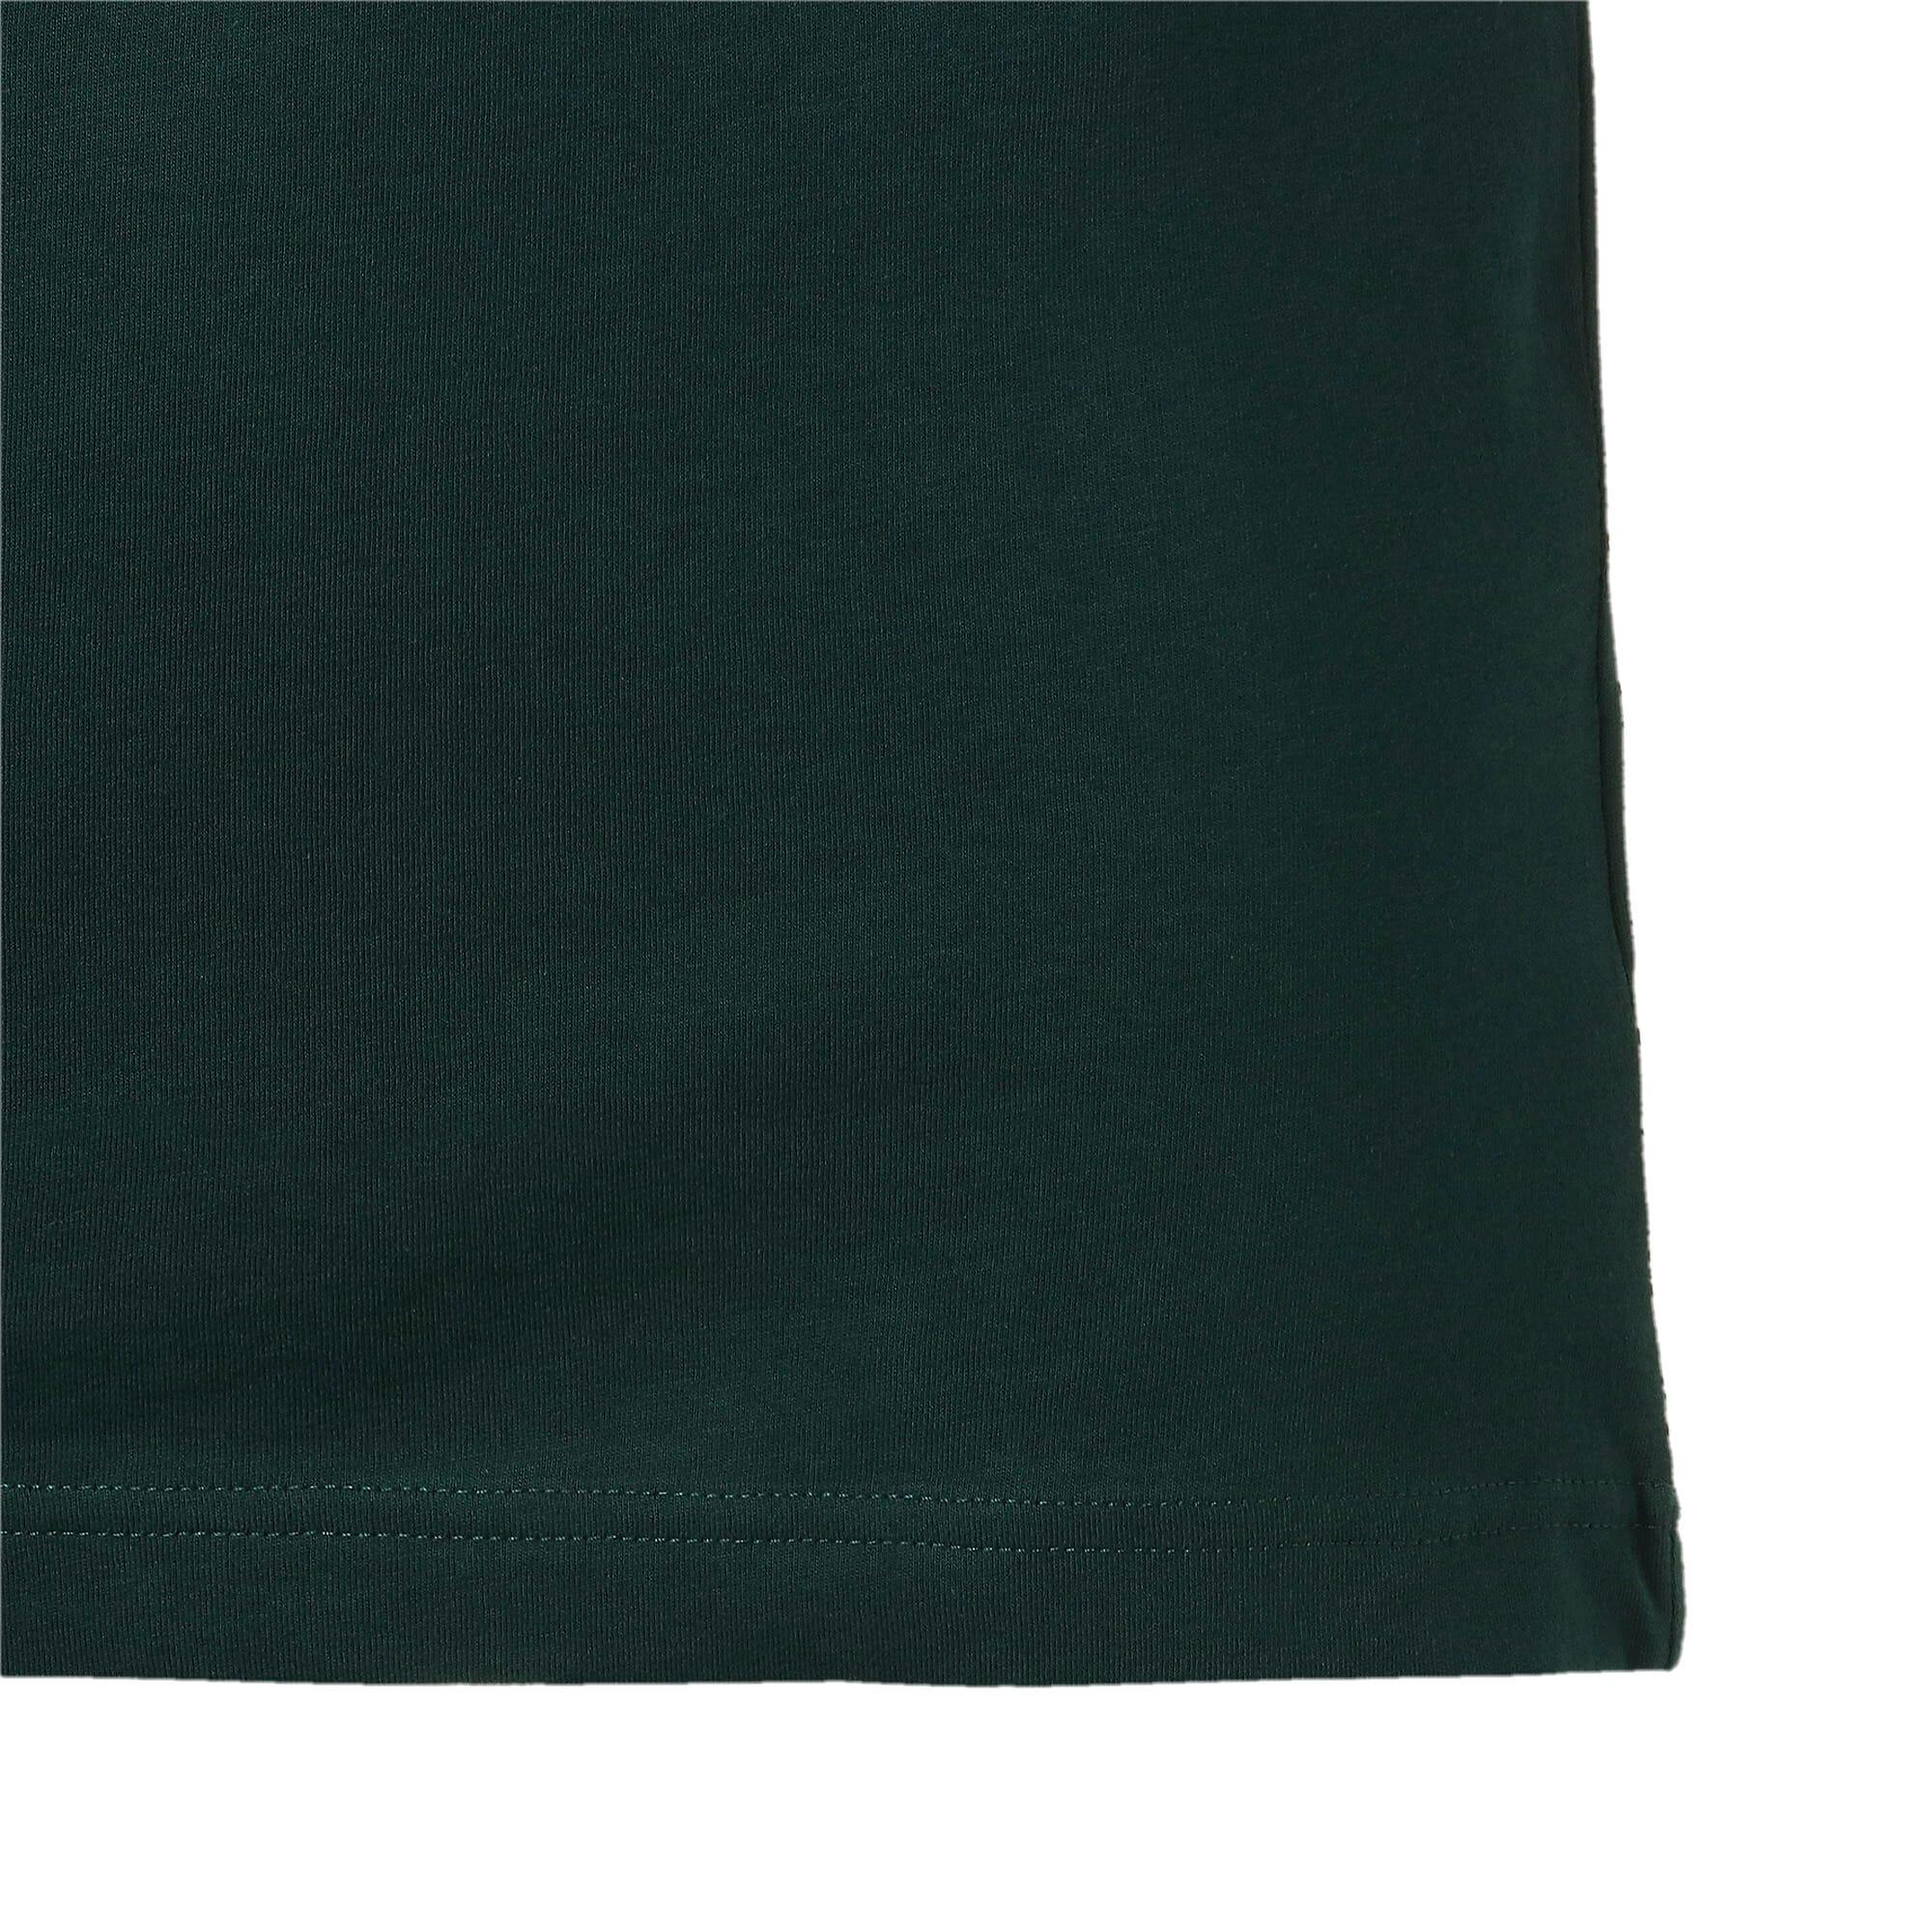 Thumbnail 6 of FIGC イタリア FTBL CULTURE Tシャツ 半袖, Ponderosa Pine, medium-JPN